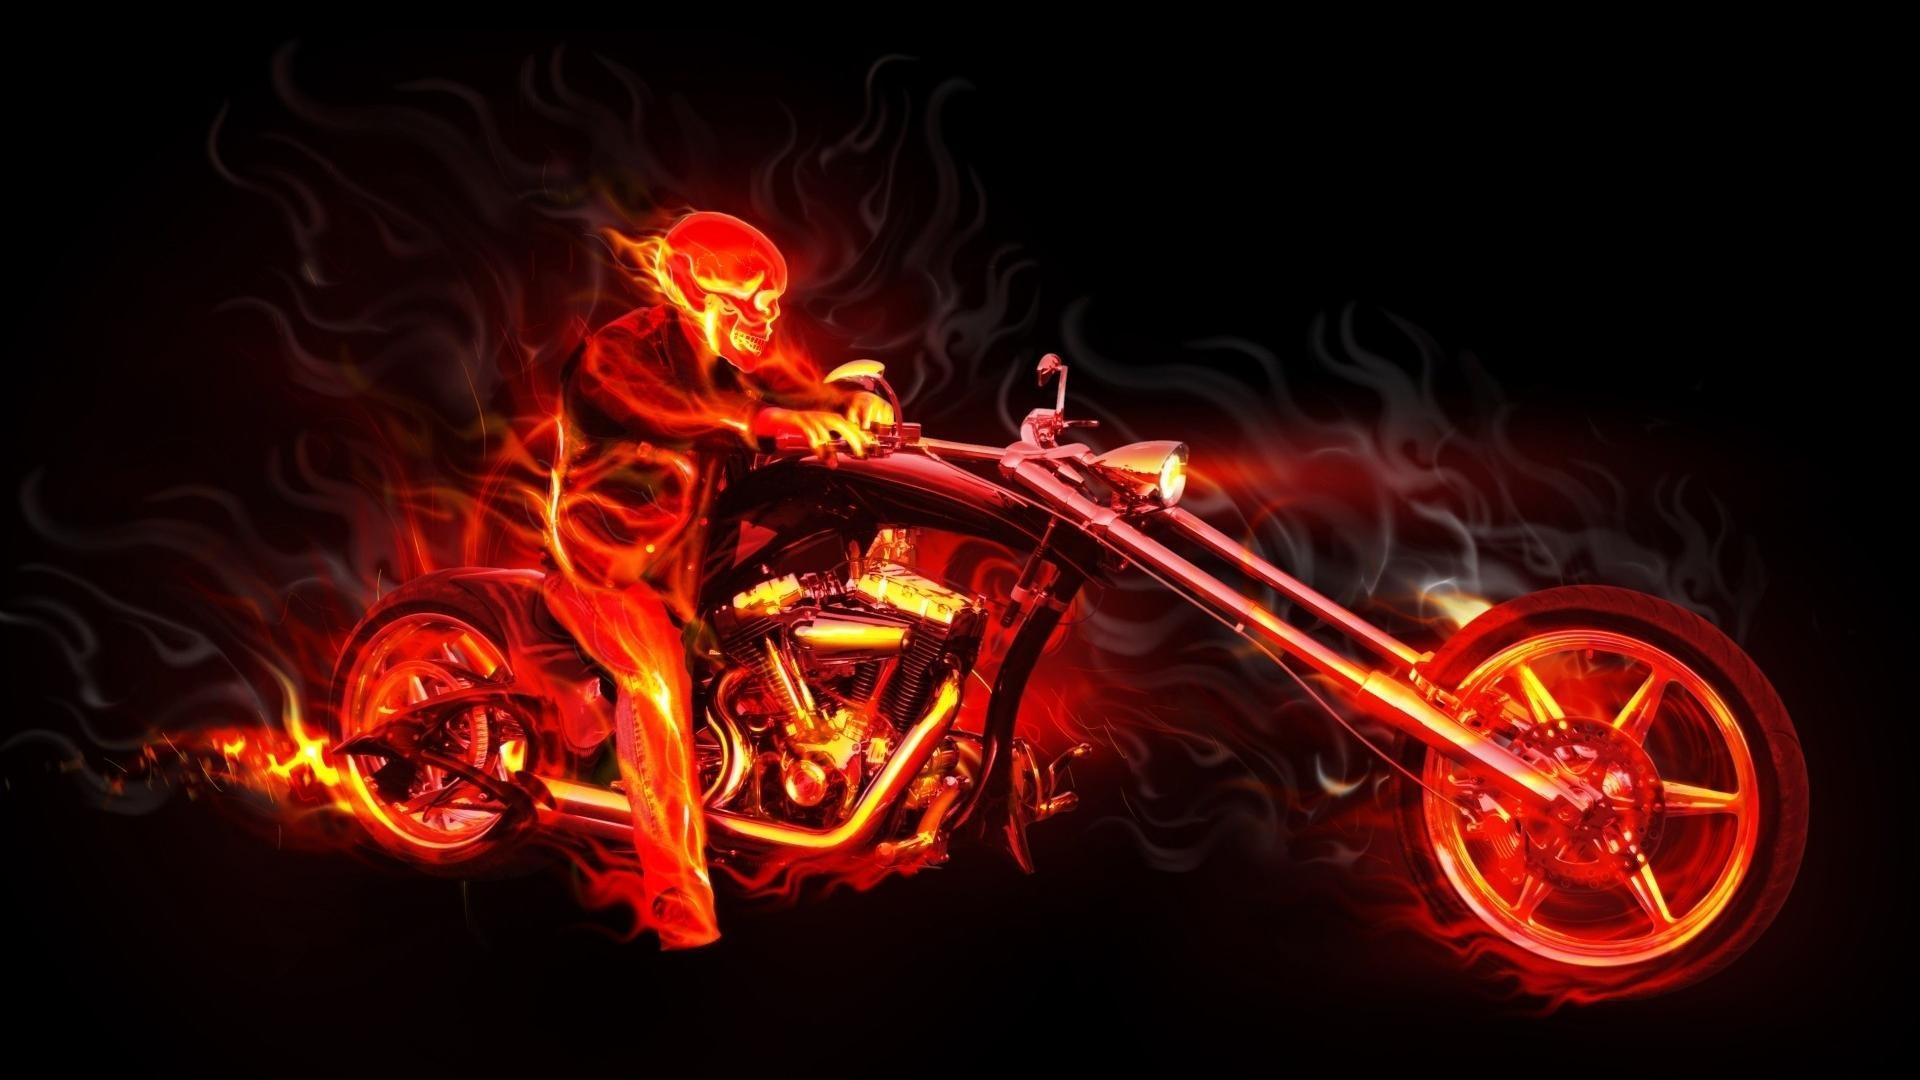 Motorcycle Flame Wallpaper 19201080 123757 HD Wallpaper Res 1920x1080